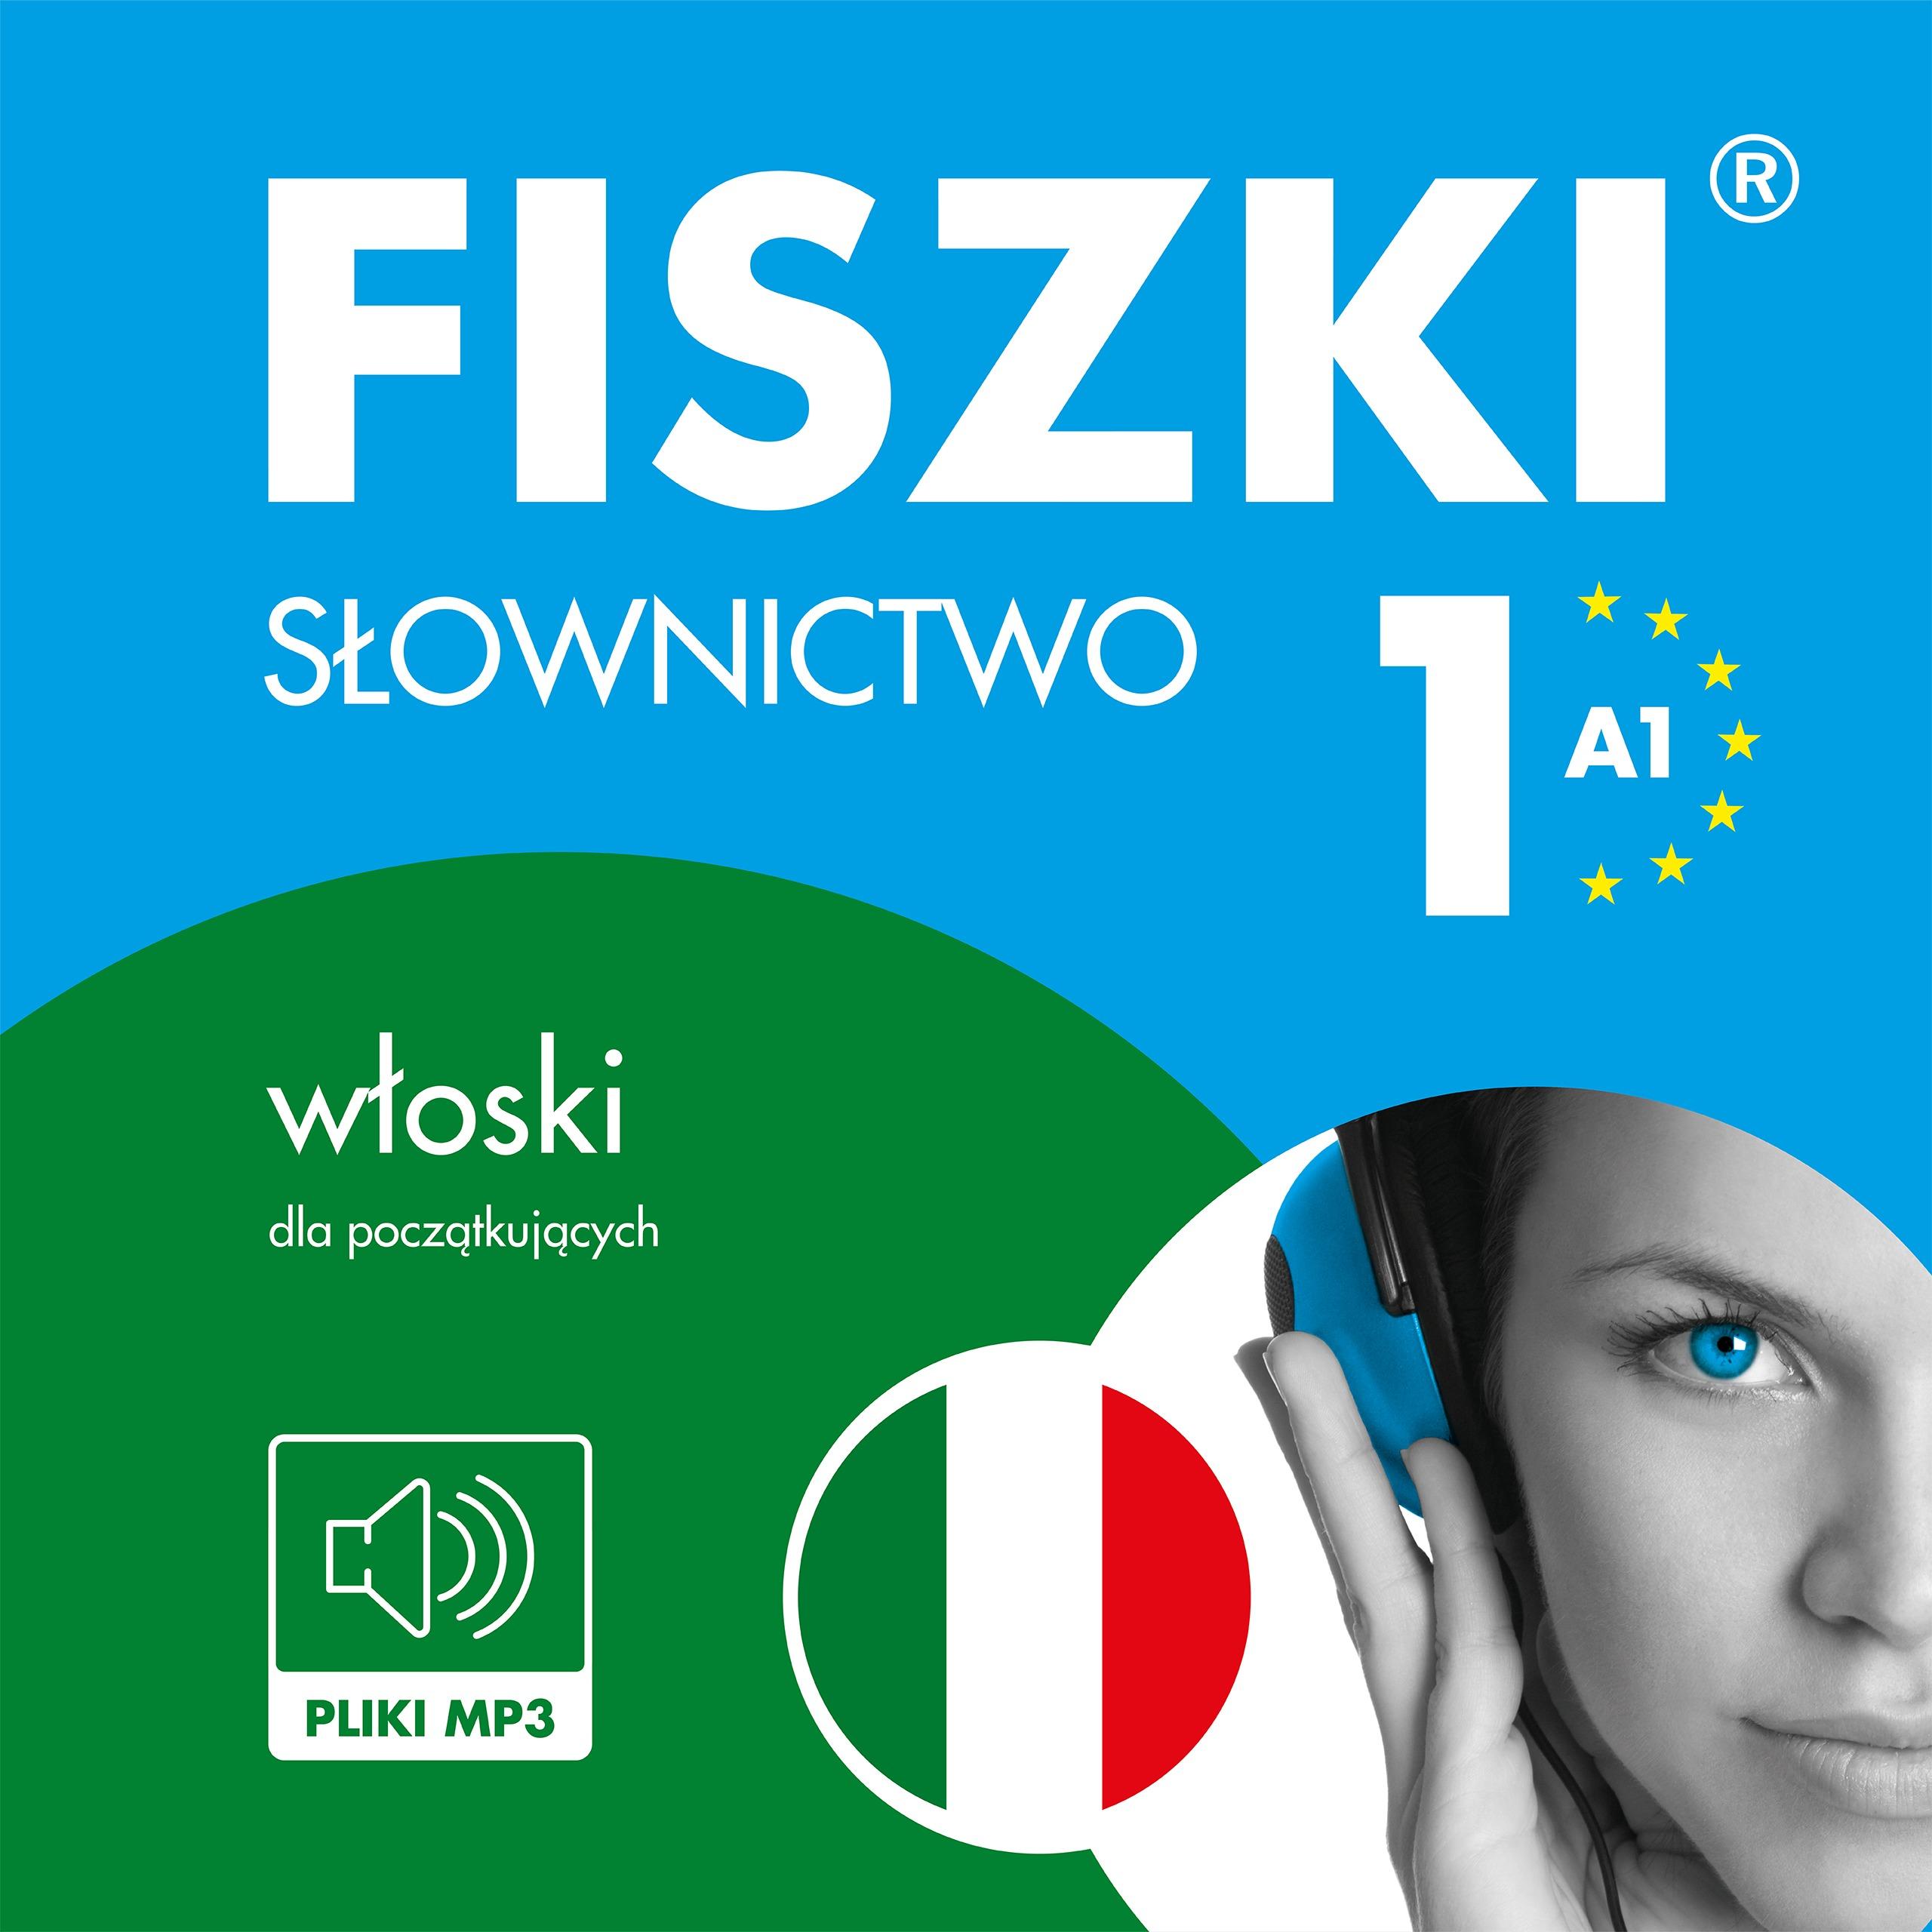 AUDIOBOOK - włoski - Słownictwo 1 (A1)